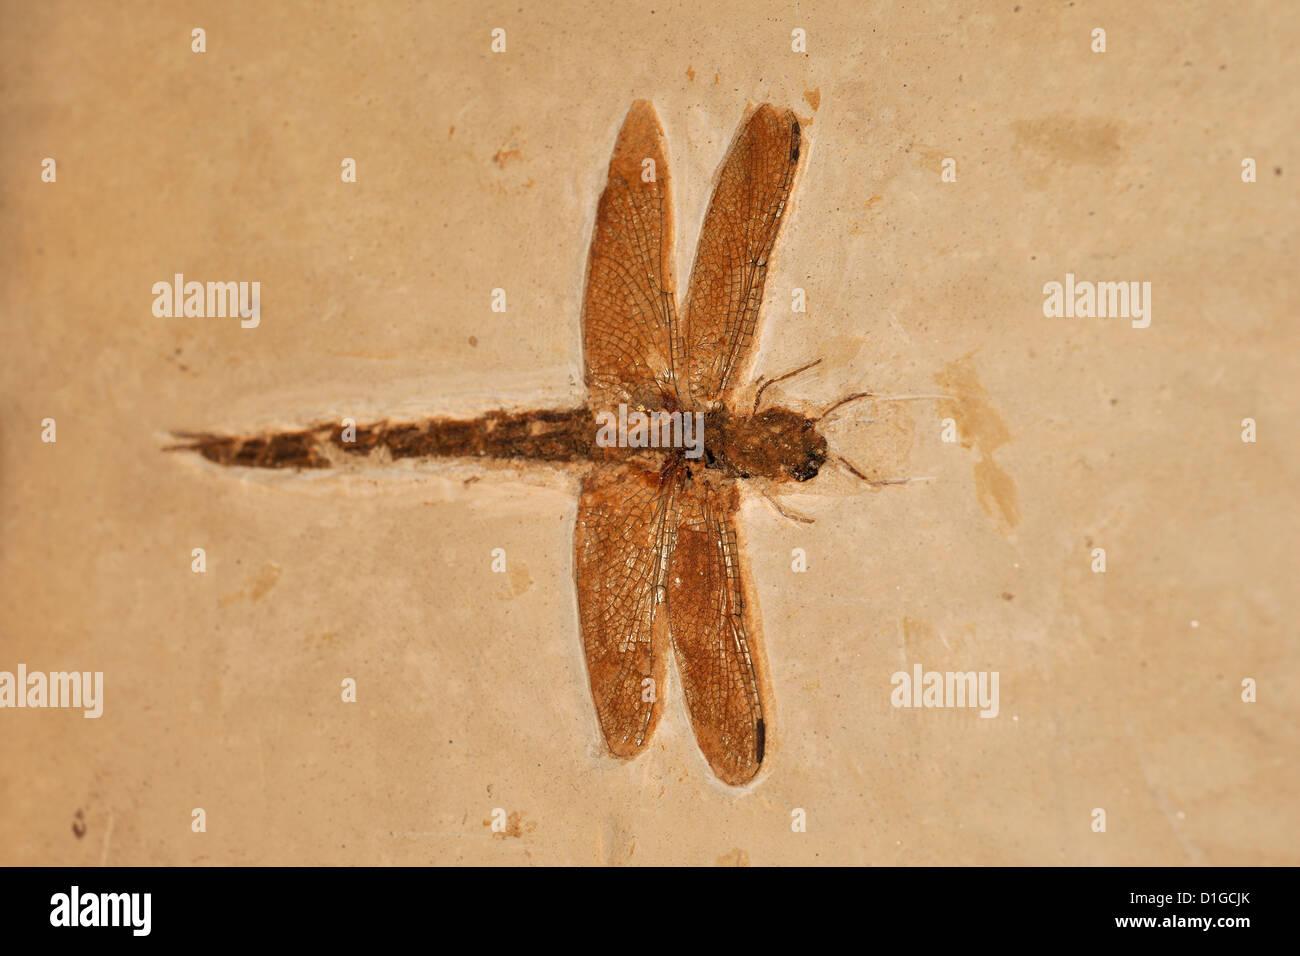 Libélula fósil, Odonata, Período Cretácico, Grado, Italia Imagen De Stock